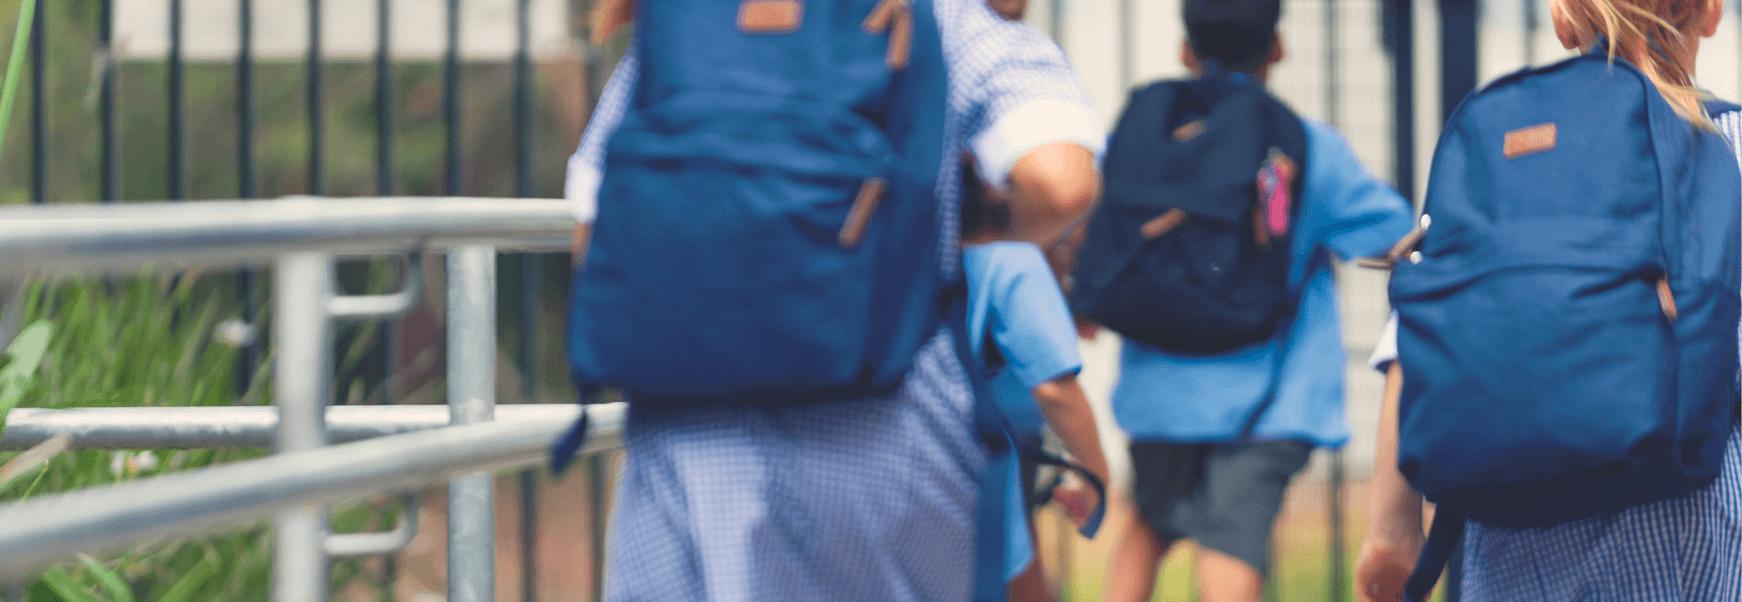 Ashley Berner: Rethinking America's School Systems